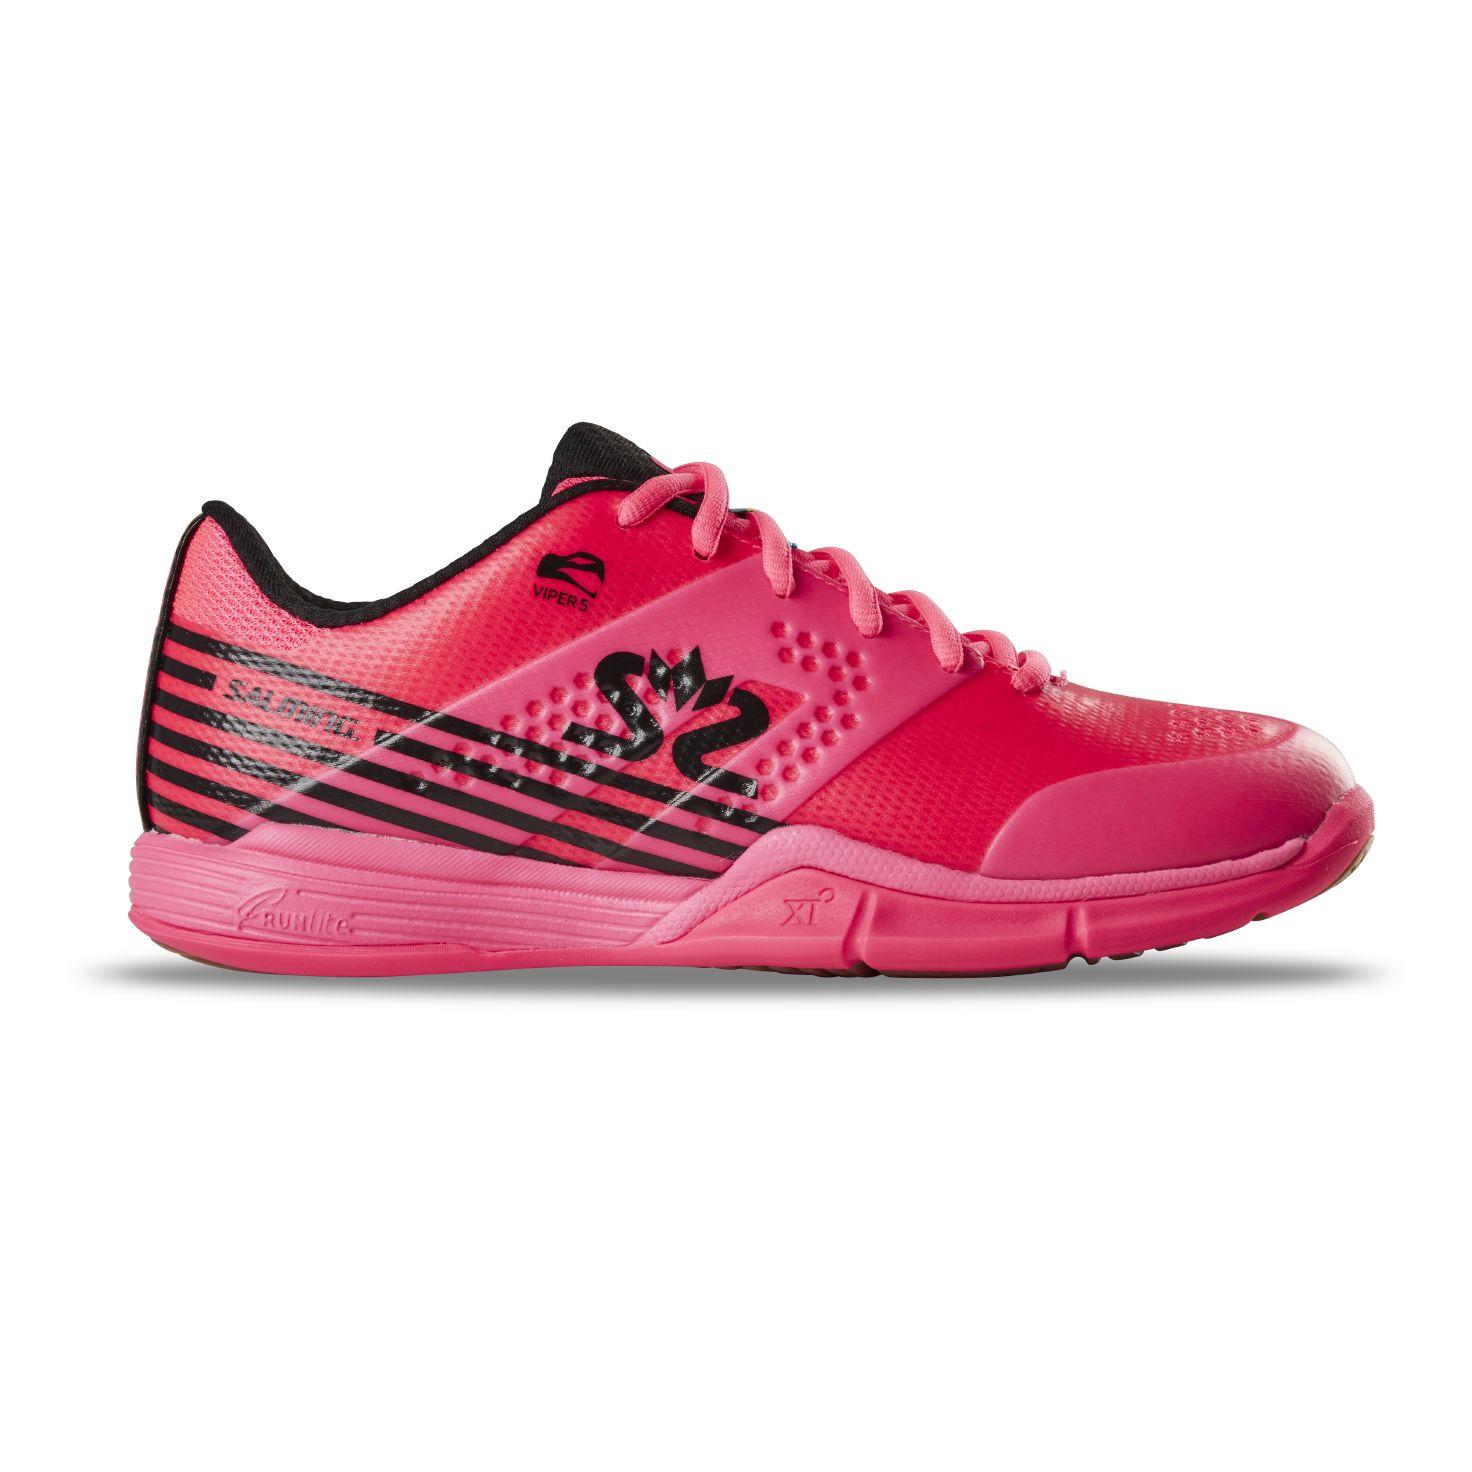 Salming Viper 5 Shoe Women Pink/Black 4,5 UK - 37 1/3 EUR - 23,5 cm